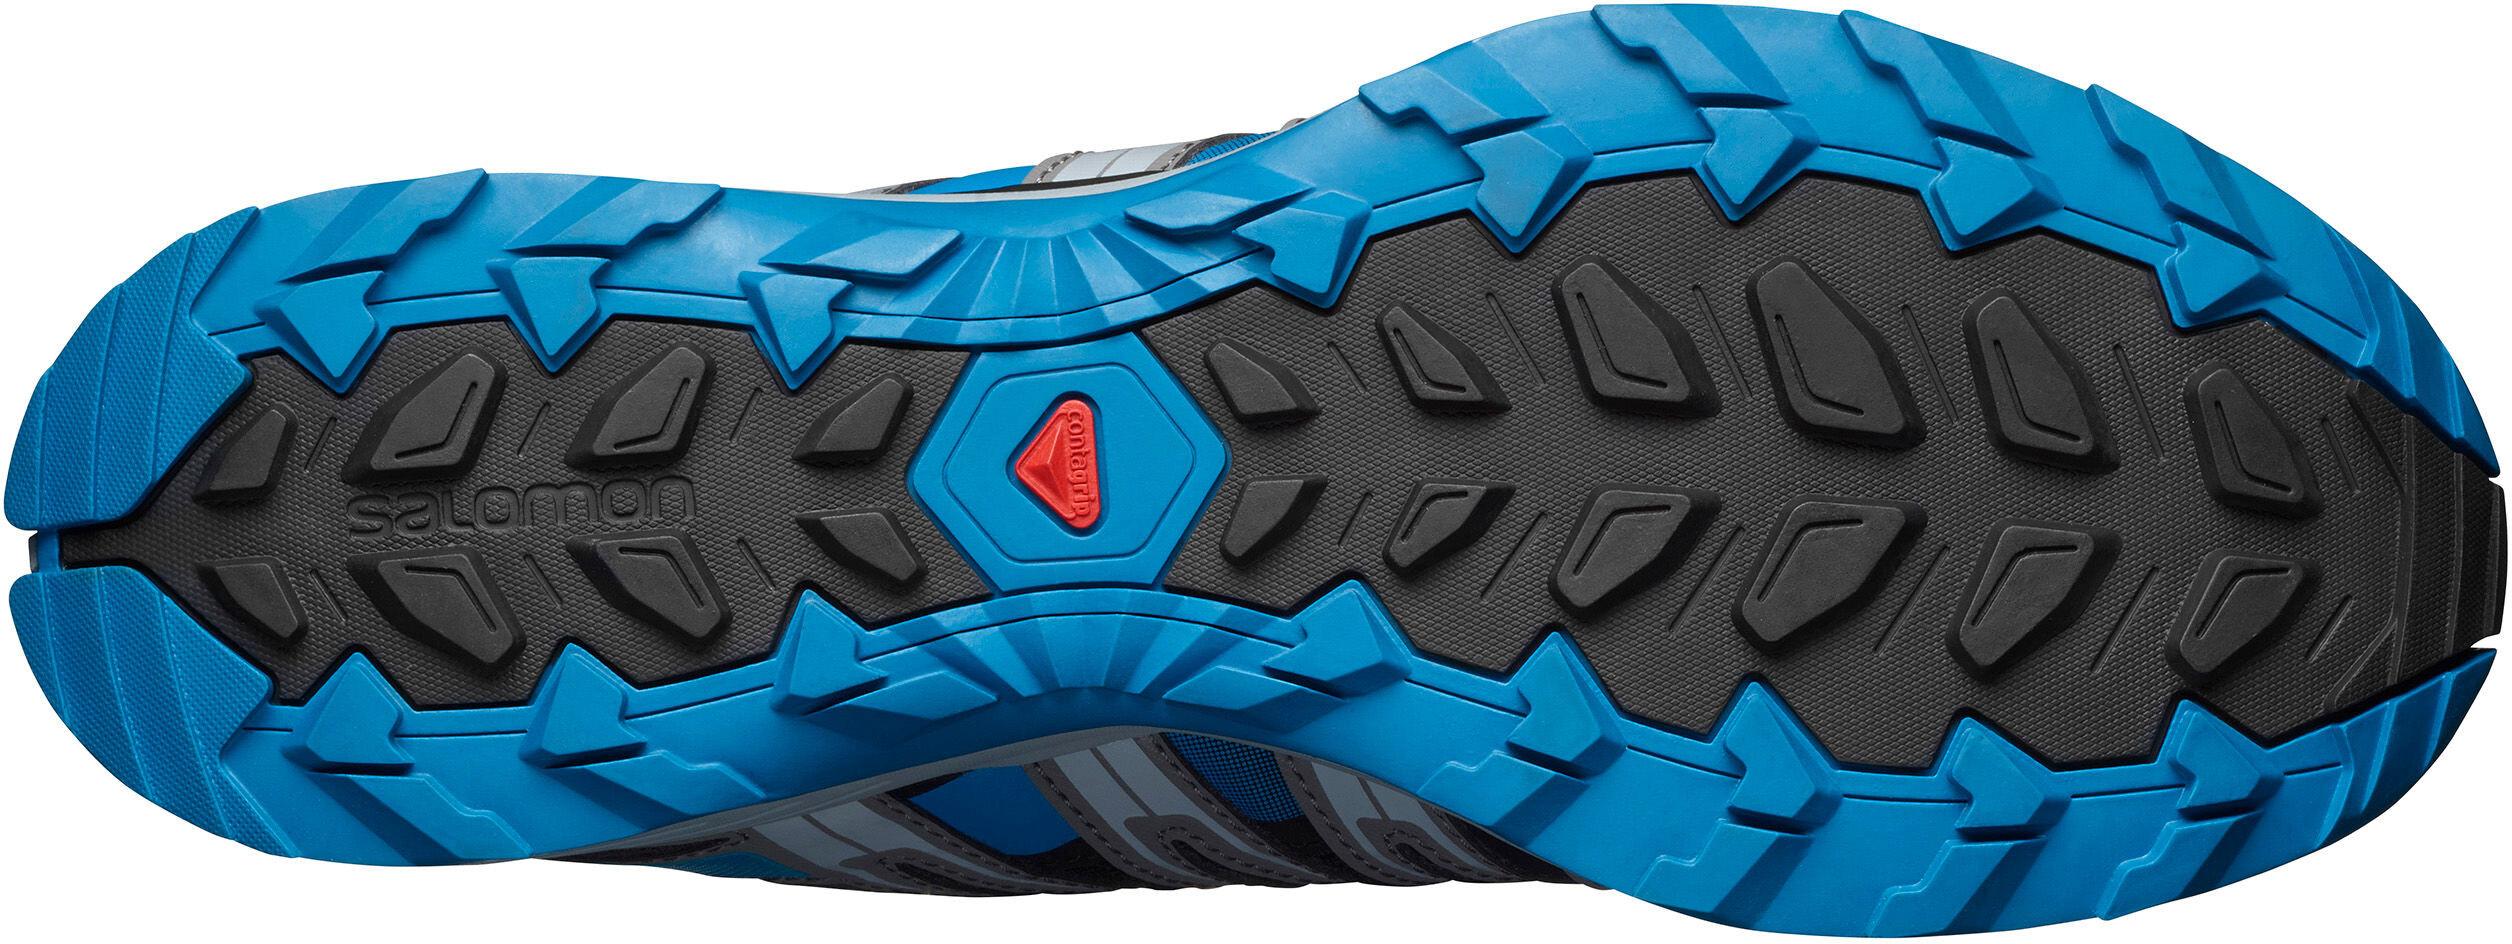 Salomon Xa Lite Trail Running Shoes